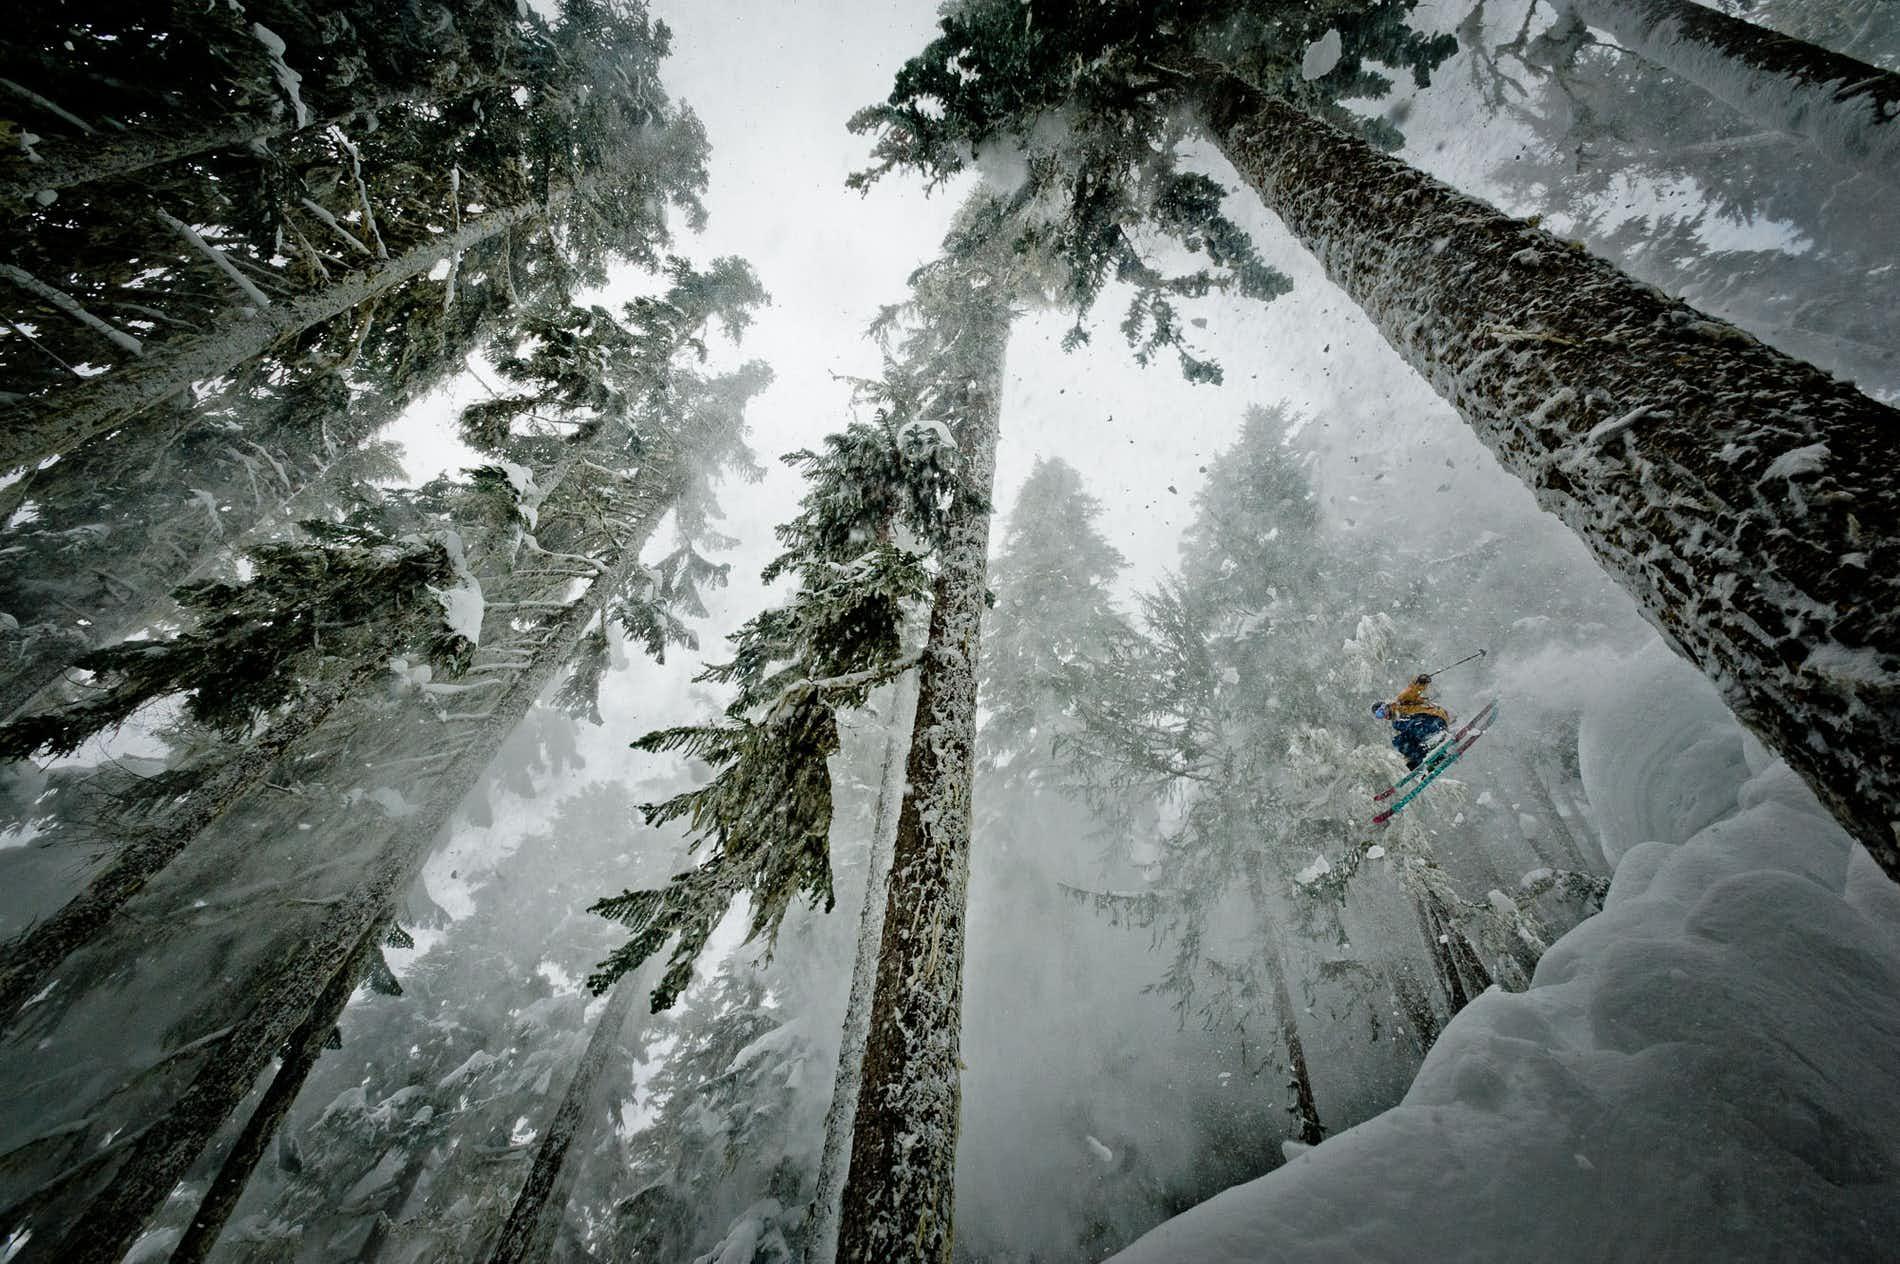 skiing smartphone camera